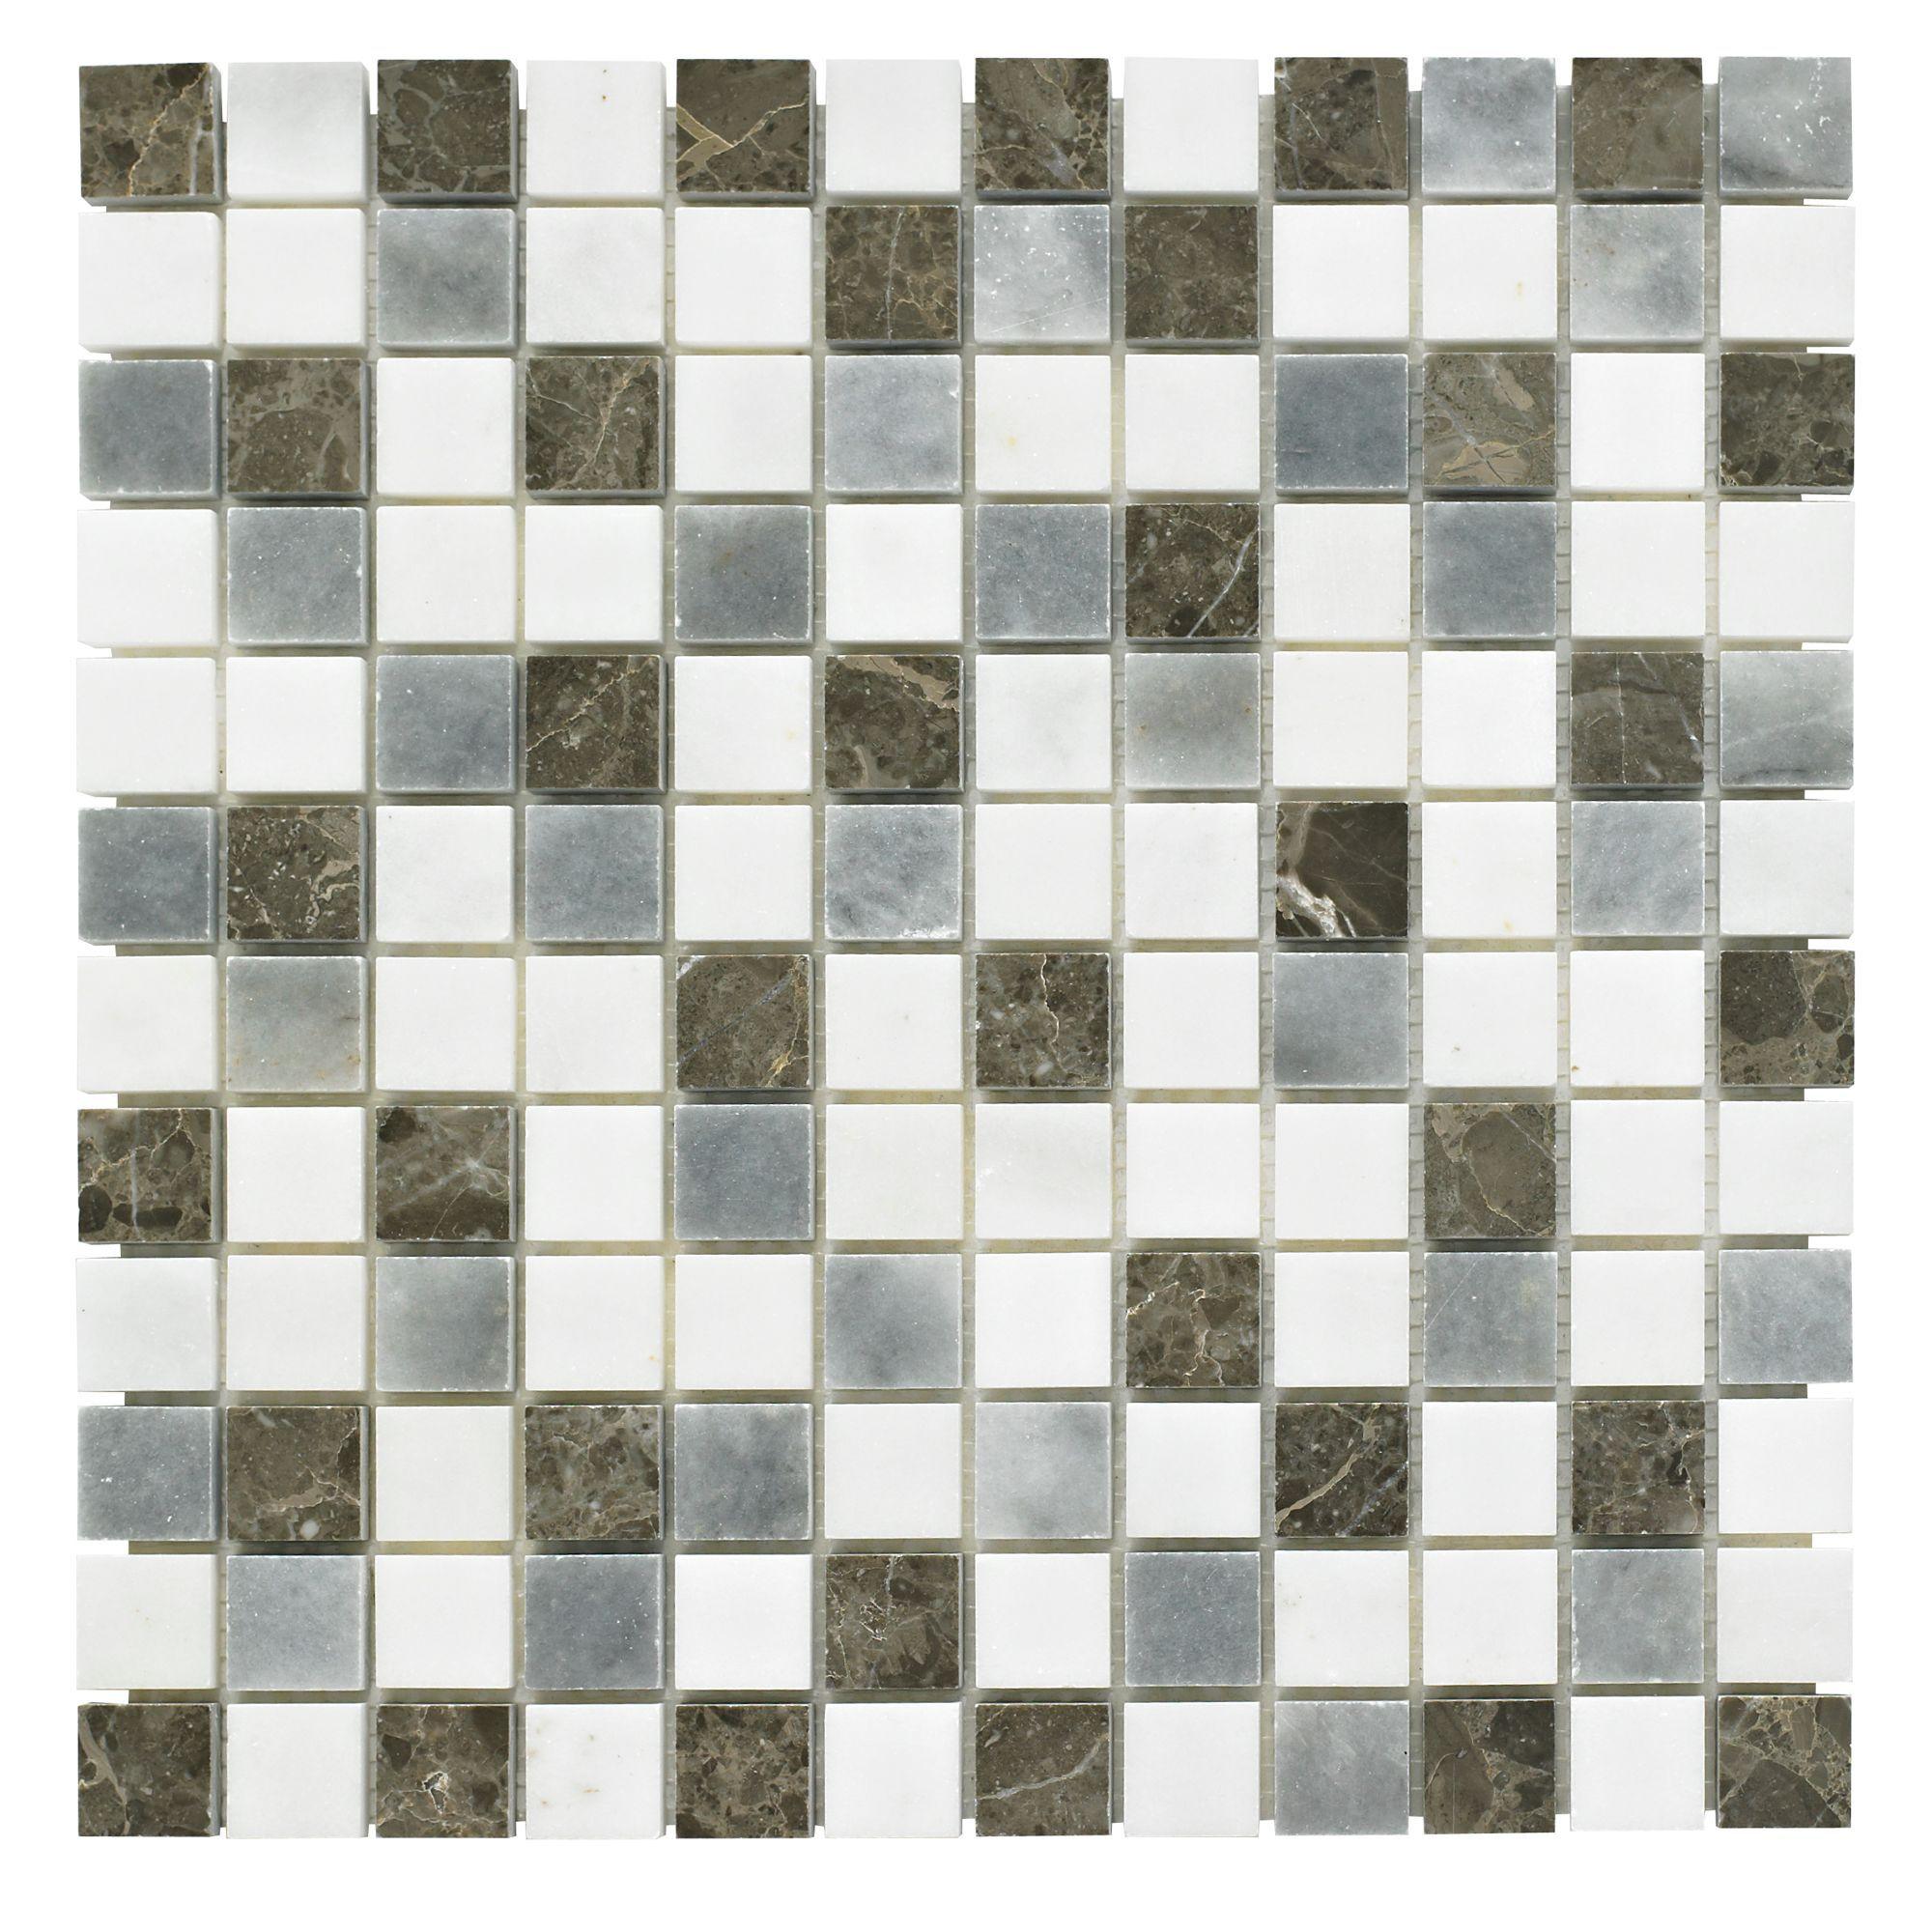 blue mosaic marble mosaic tile l 305mm w 305mm. Black Bedroom Furniture Sets. Home Design Ideas